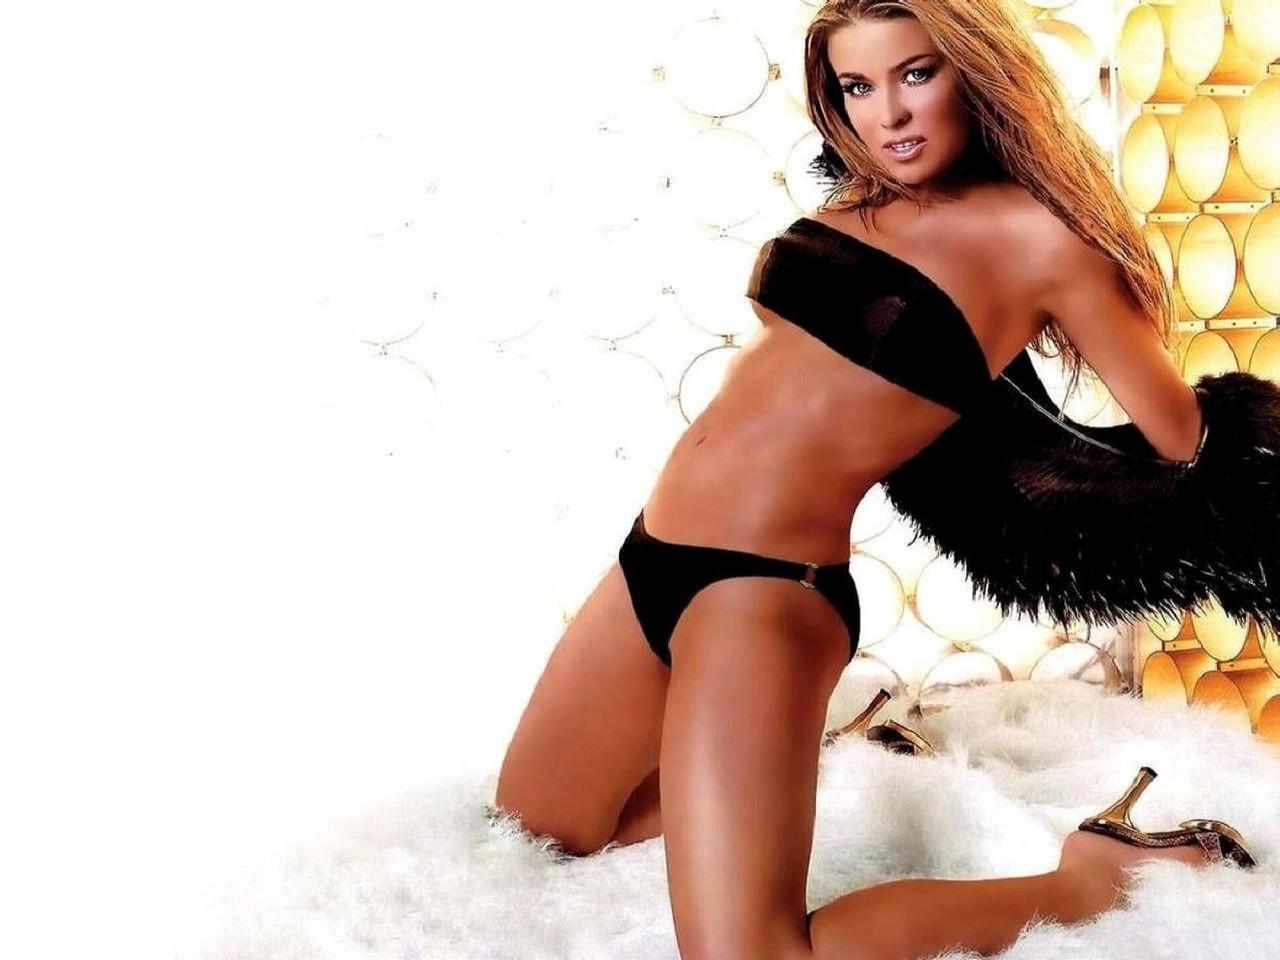 Wallpaper di Carmen Electra in bikini nero